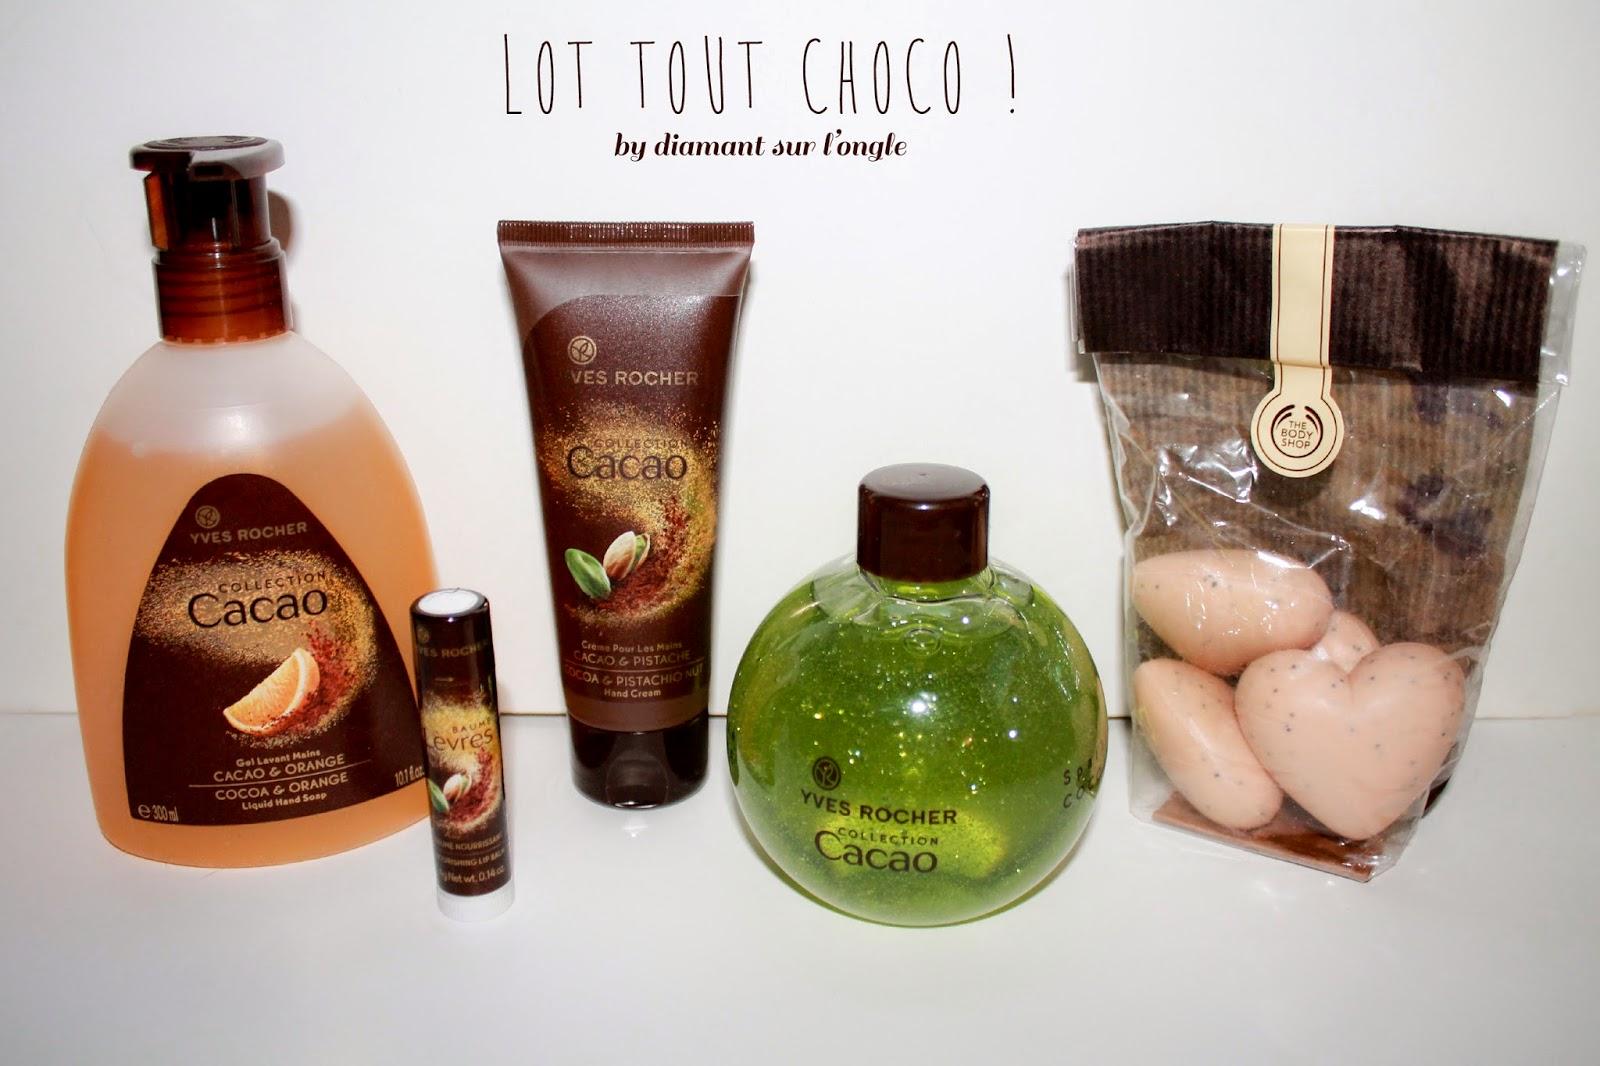 Lot Tout choco